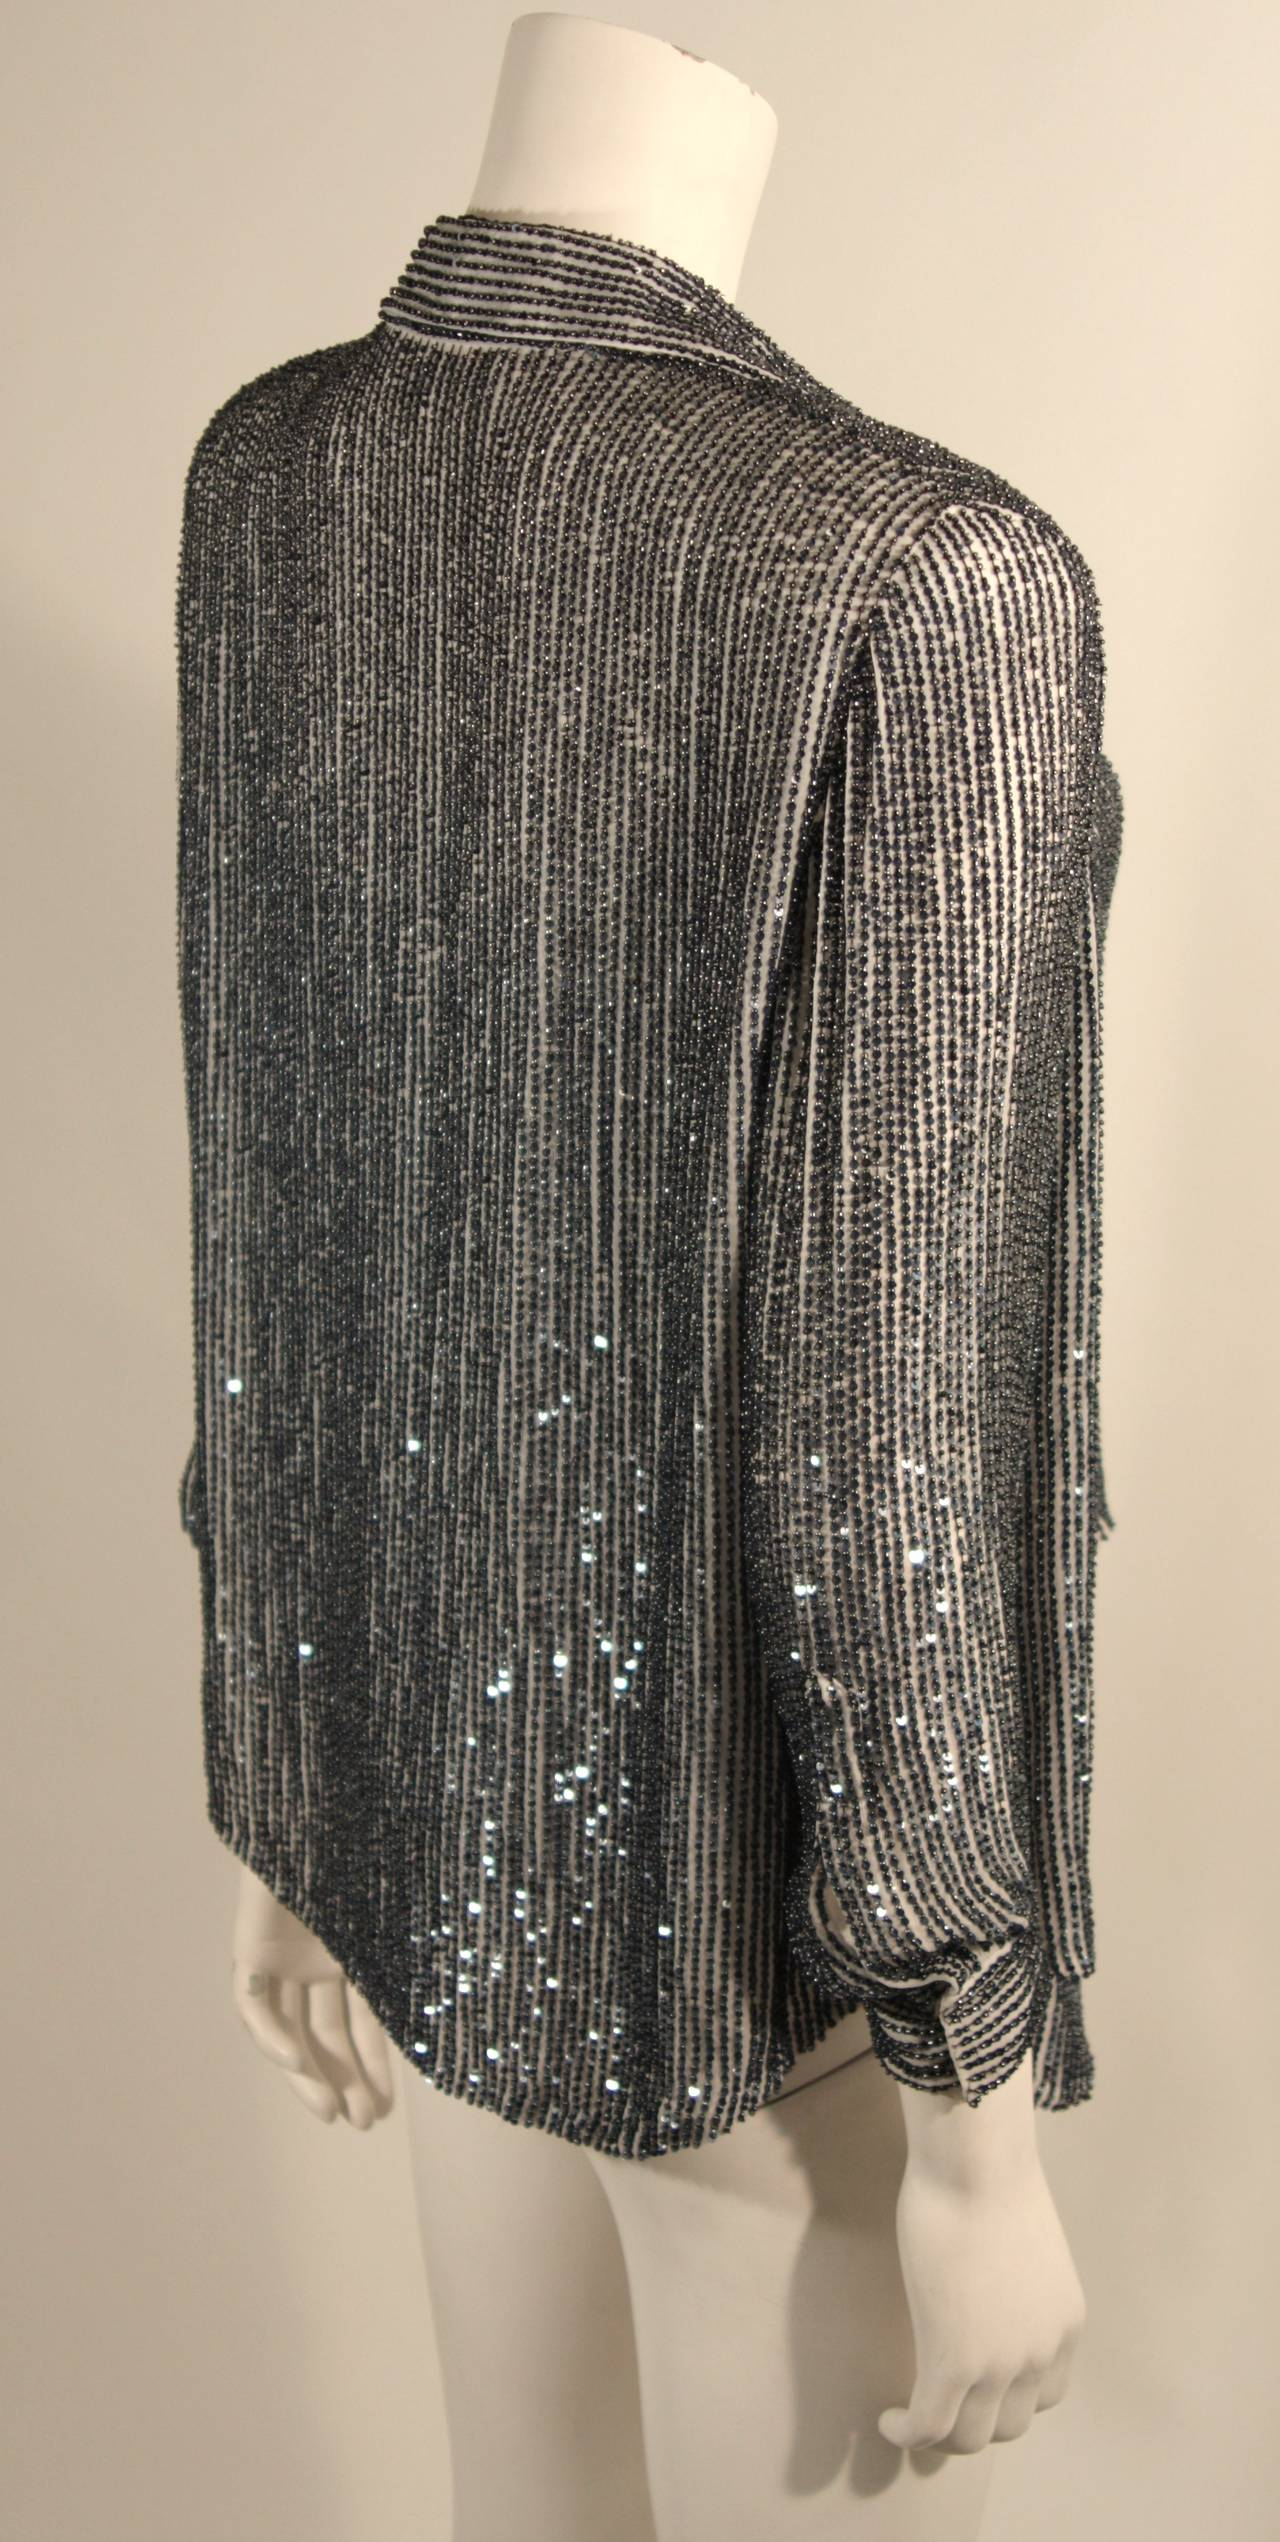 Oscar De La Renta Evening Blouse and Camisole Size 8 For Sale 1